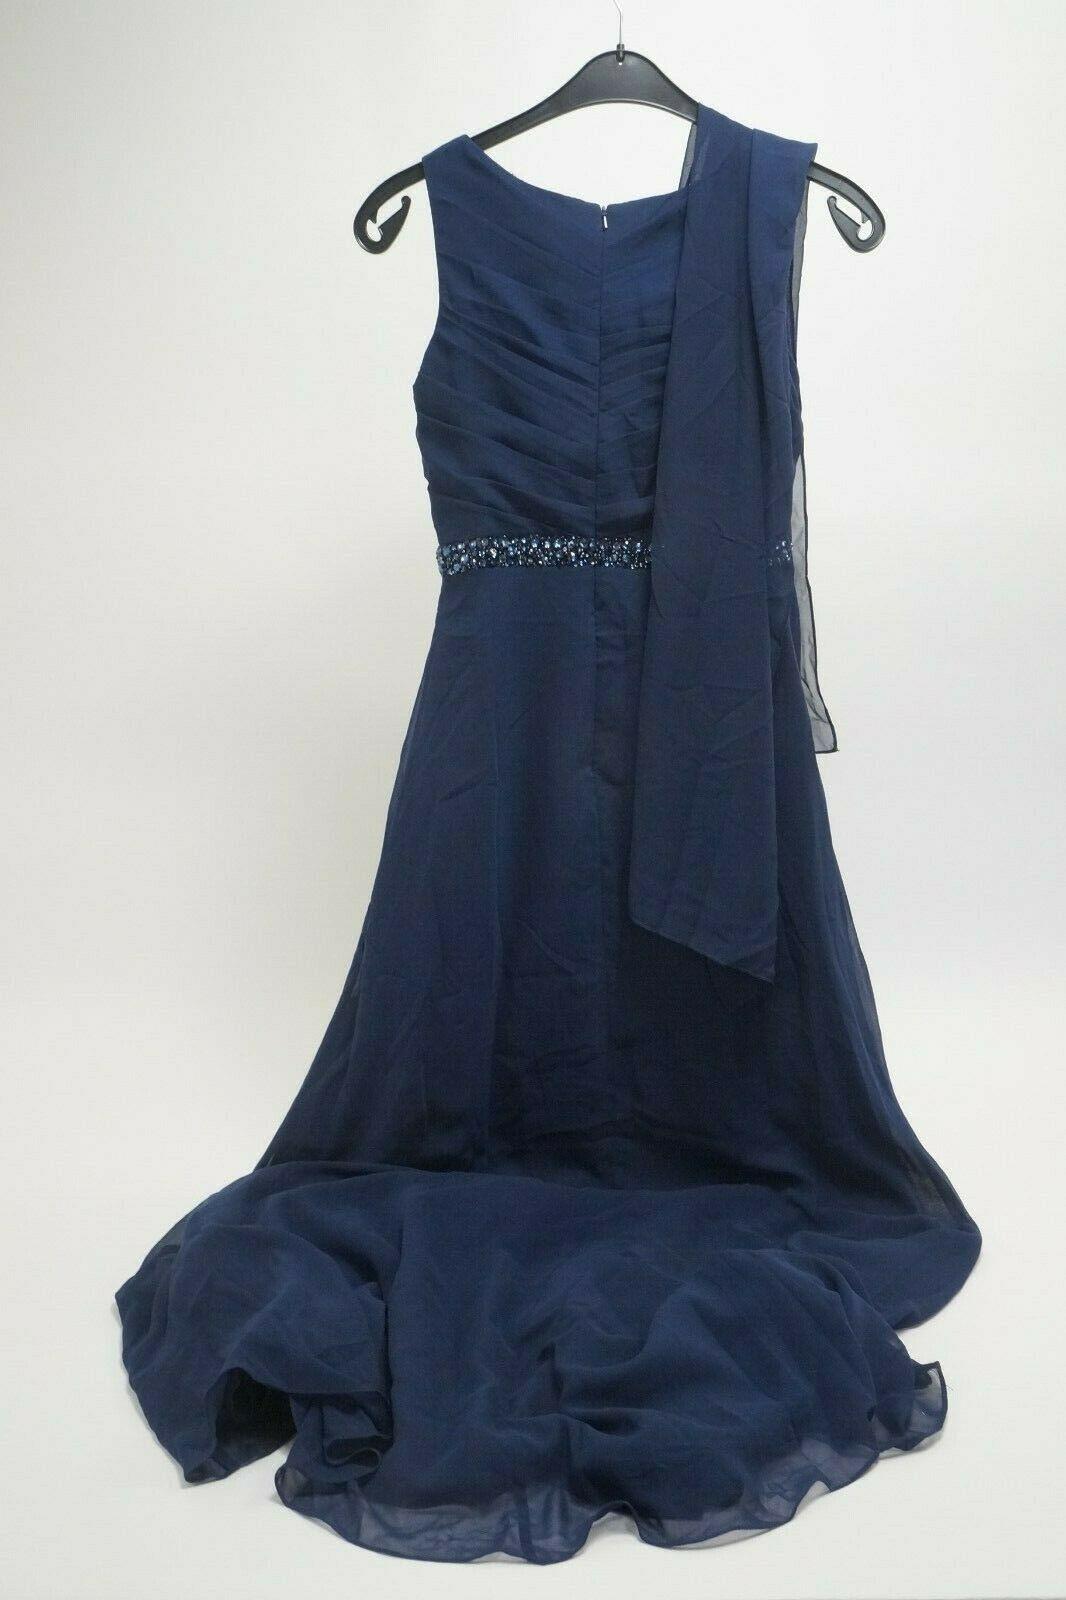 Designer Kreativ Abend Maxi Kleid Design17 Genial Abend Maxi Kleid Stylish